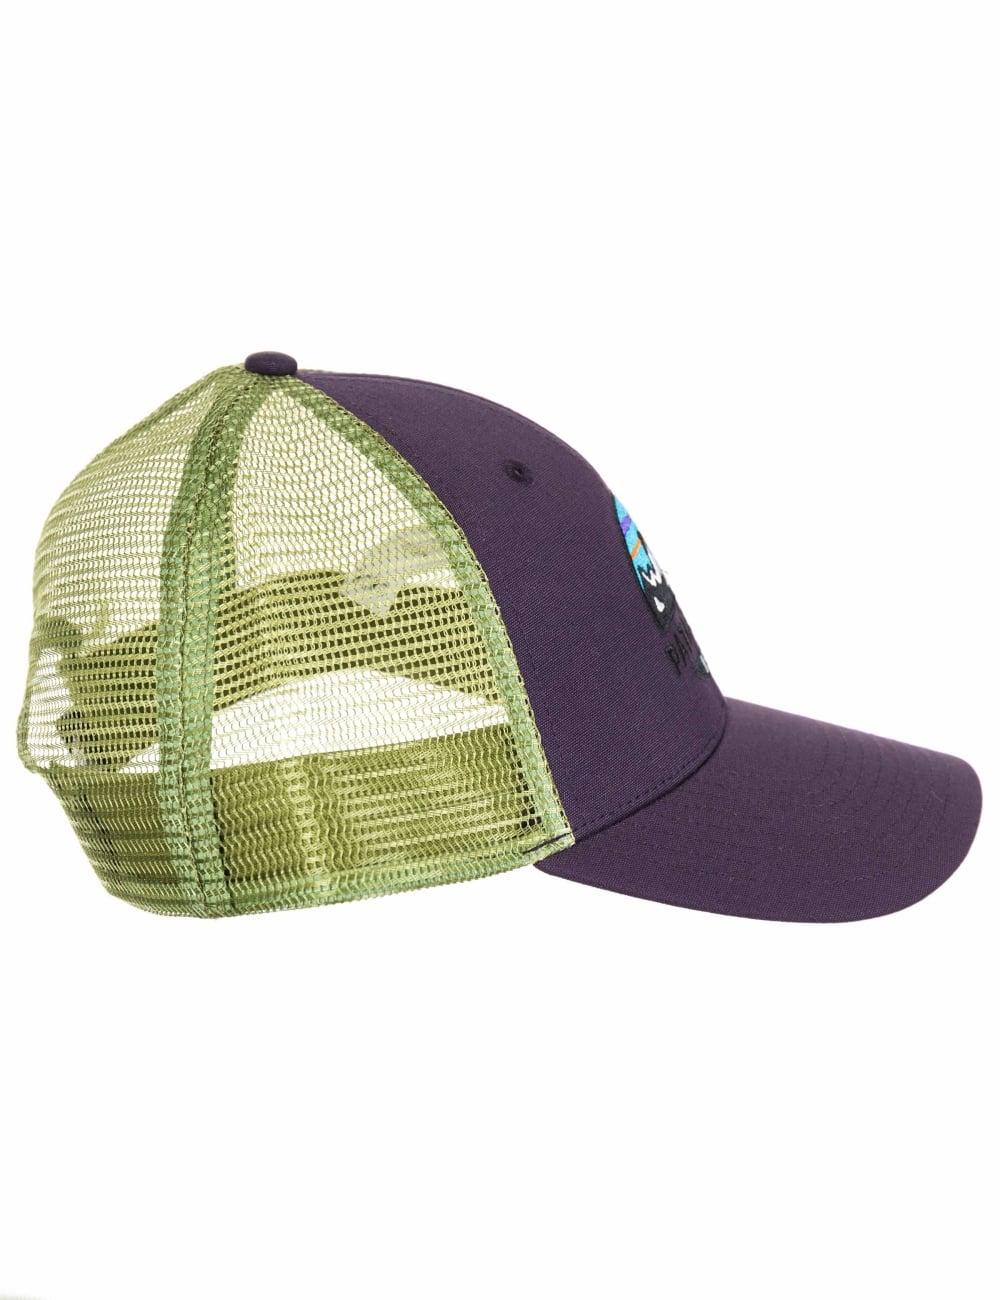 b22823cc5 Patagonia Fitz Roy Scope LoPro Trucker Hat - Piton Purple - Hat Shop ...